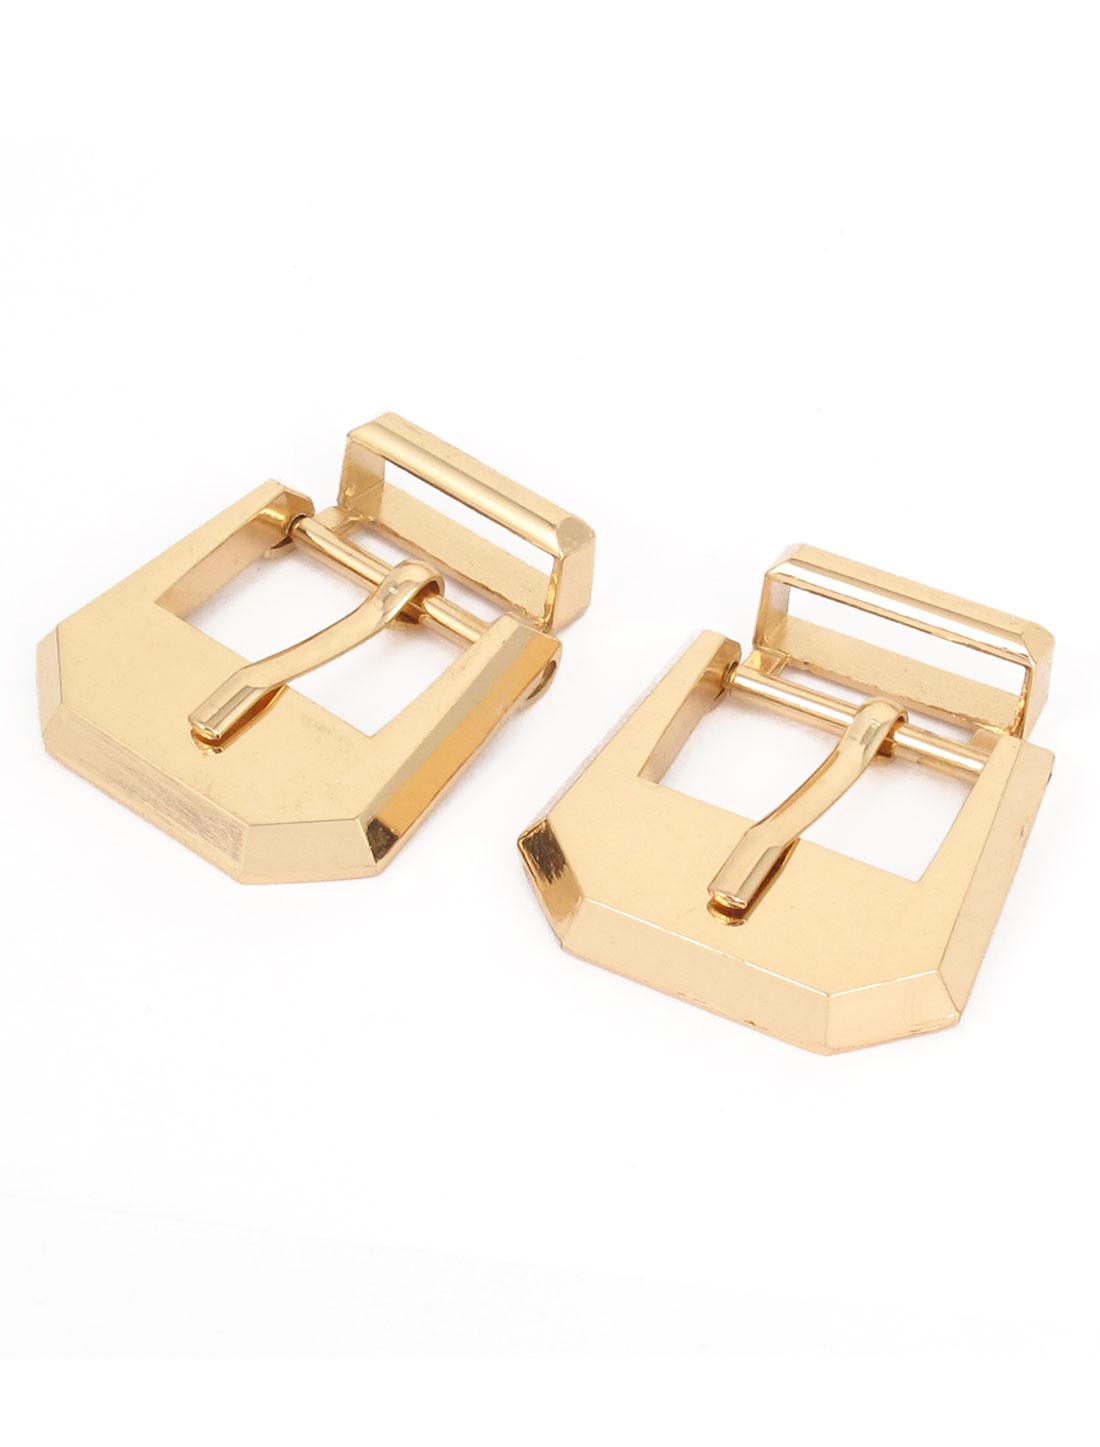 2 Pcs Gold Tone Metal Single Pin Buckle for Belt